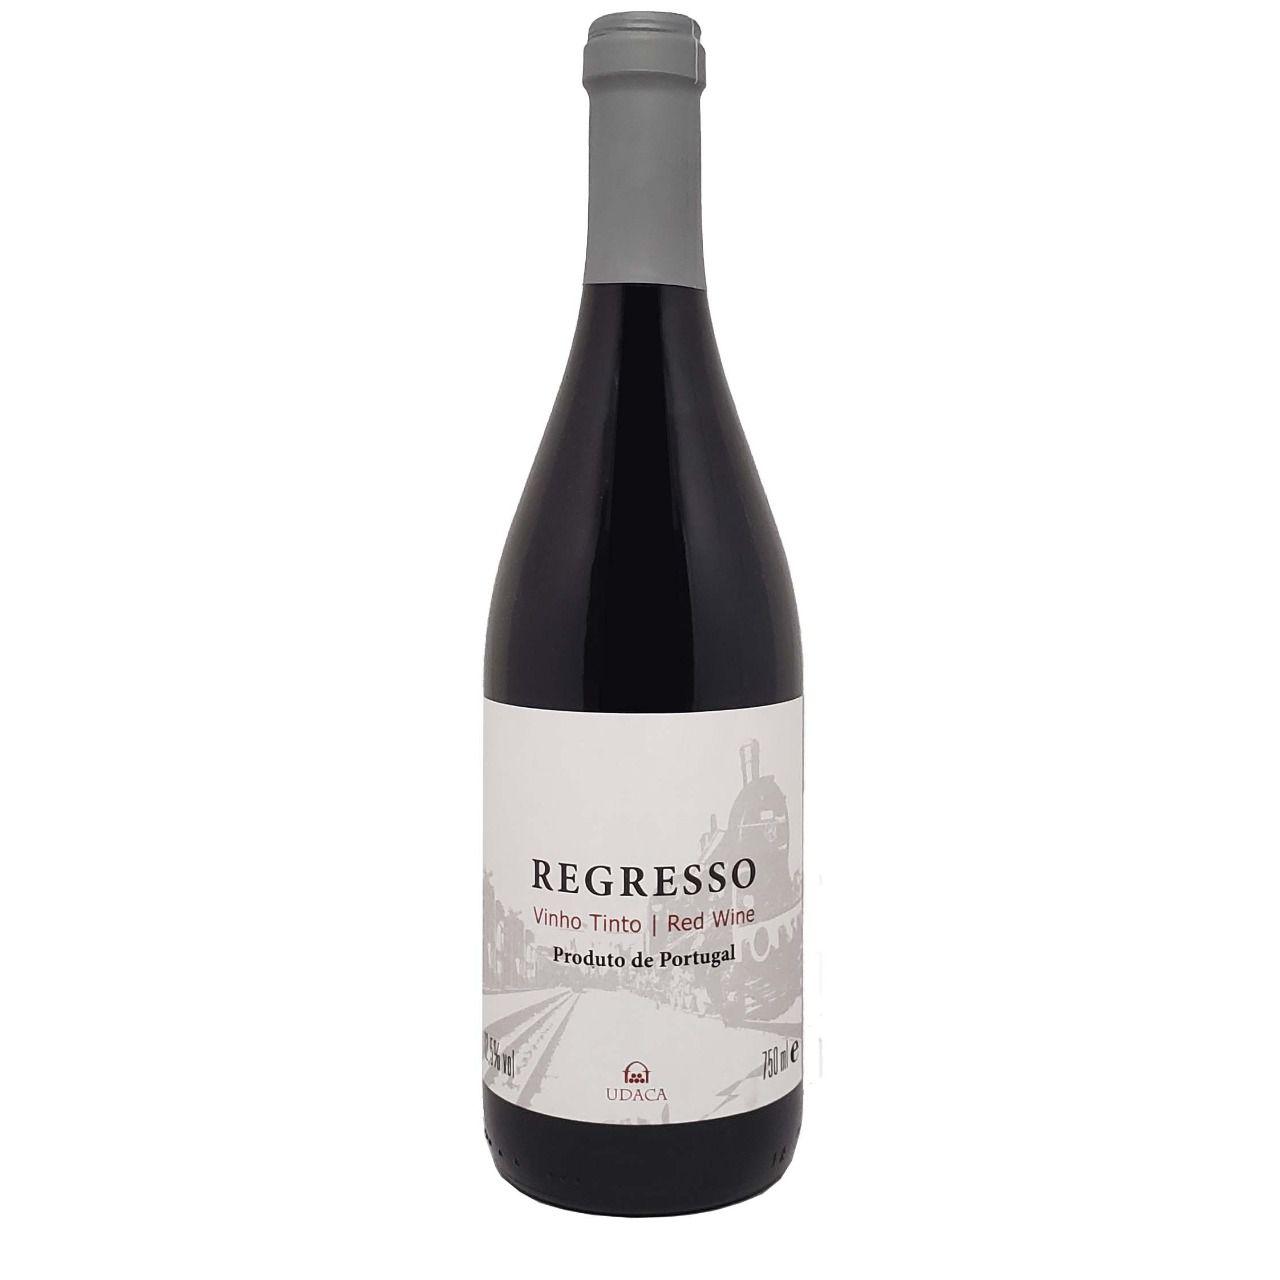 Vinho Tinto Regresso Udaca - 750ml -